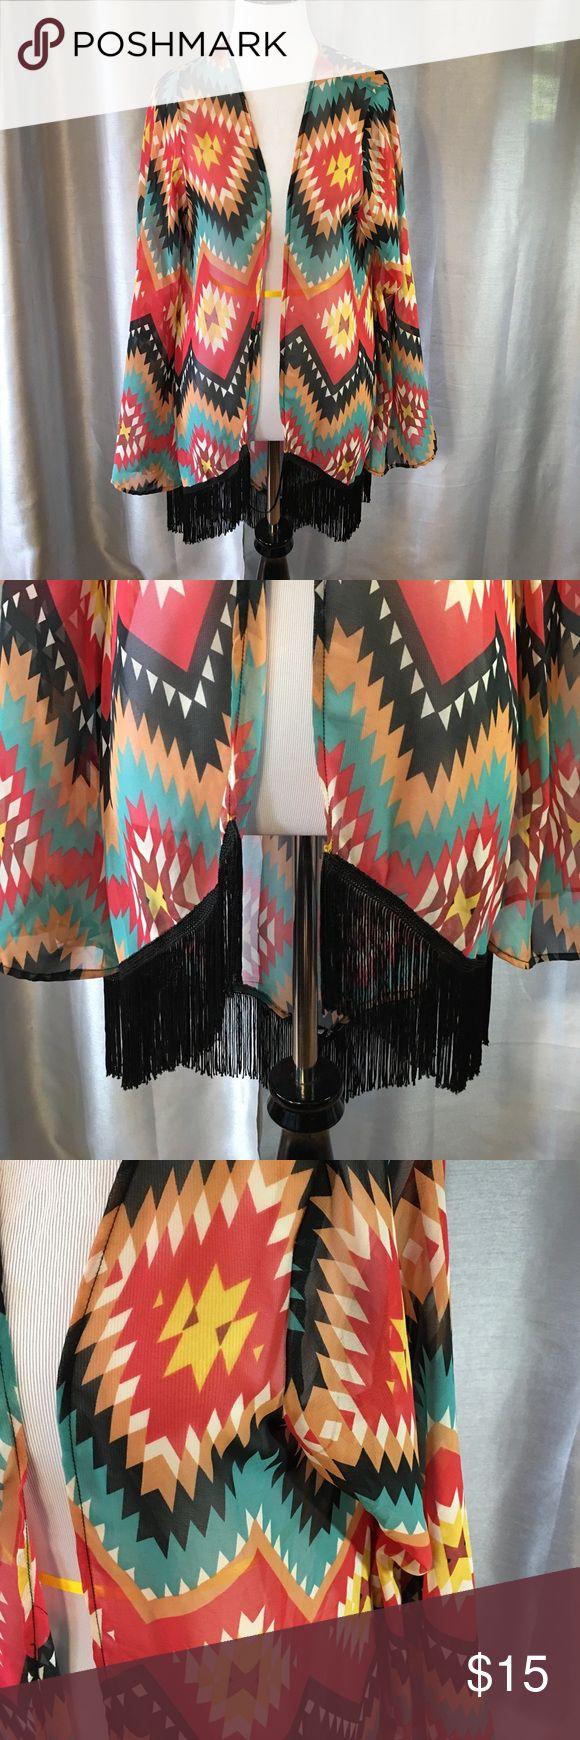 American Rag Aztec print cardigan American Rag Aztec print cardigan size small/medium. Cute with a solid black dress. American Rag Sweaters Cardigans